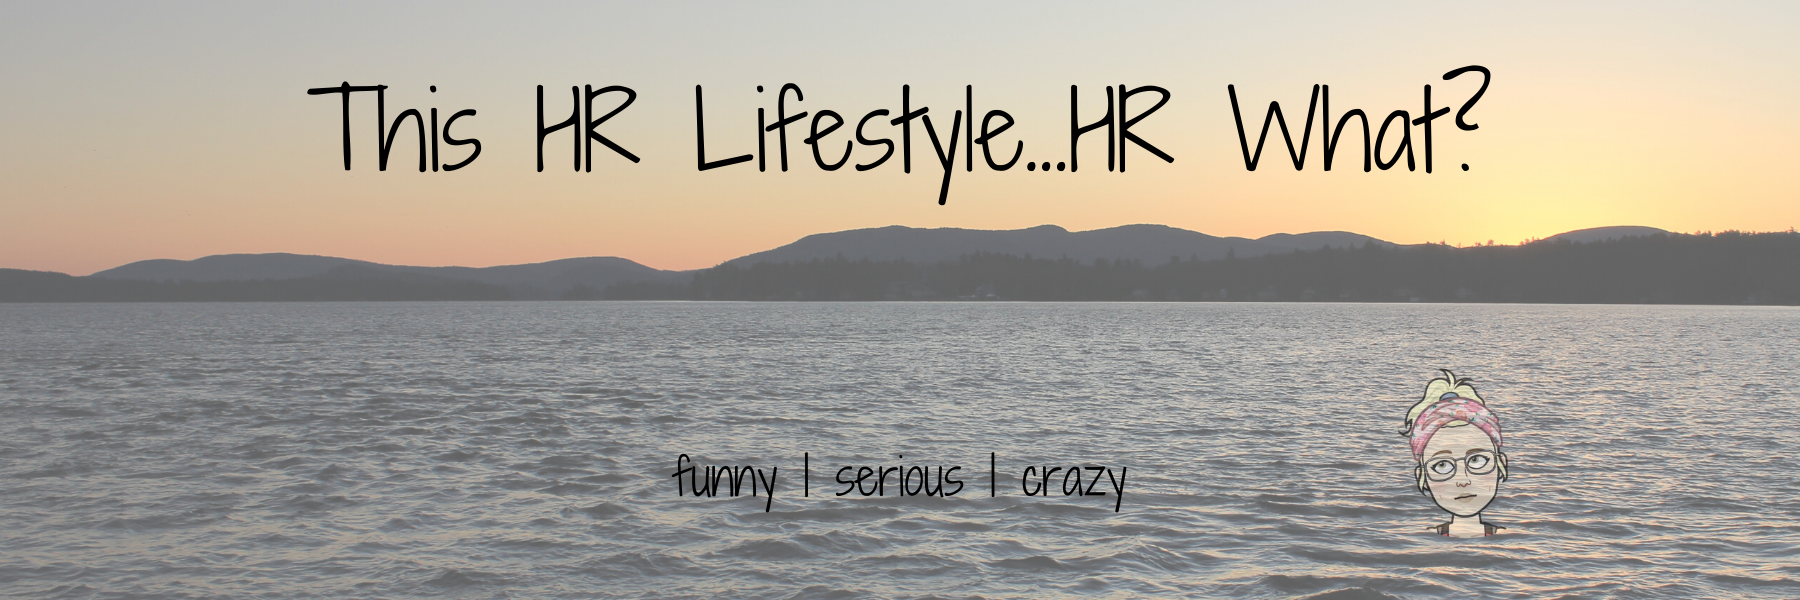 This HR Lifestyle...HR What?